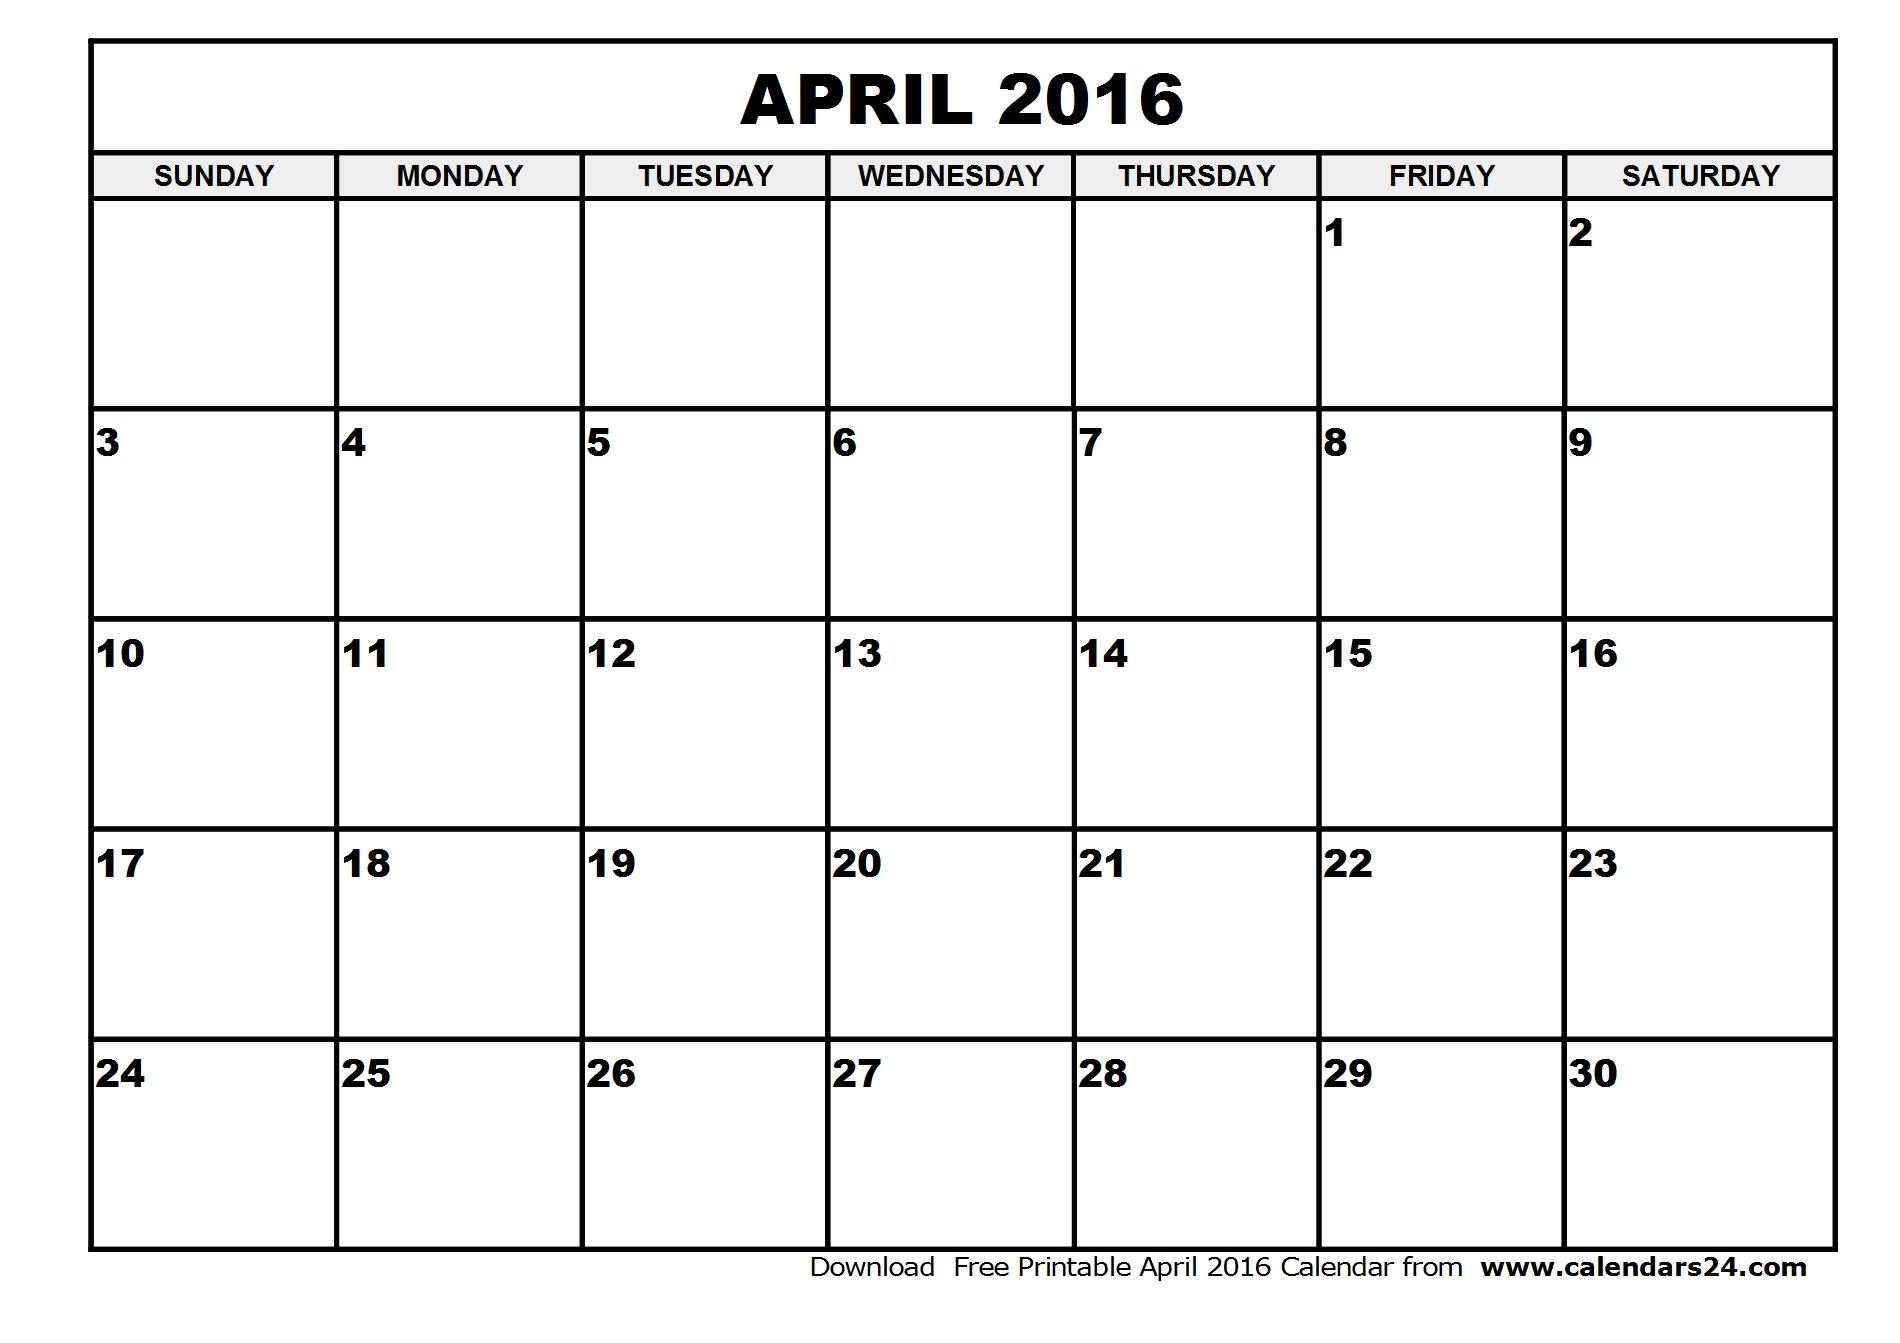 April 2016 Calendar Printable Org